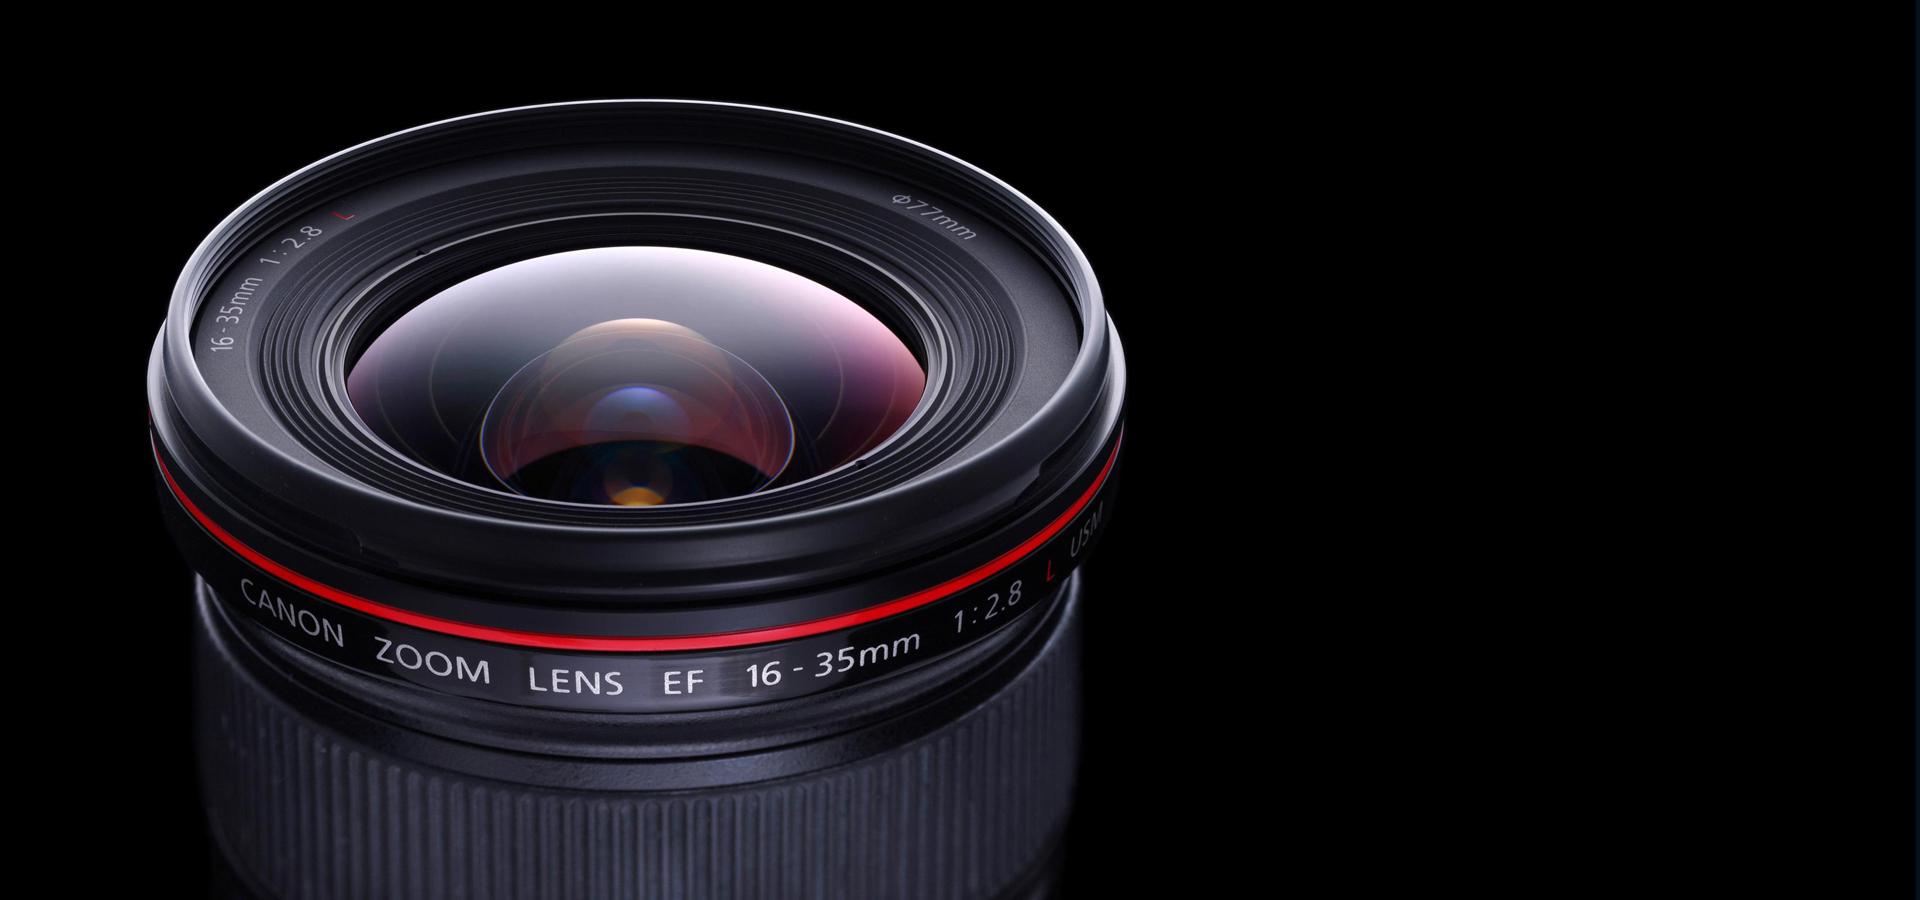 black background camera lens  camera  black  canon